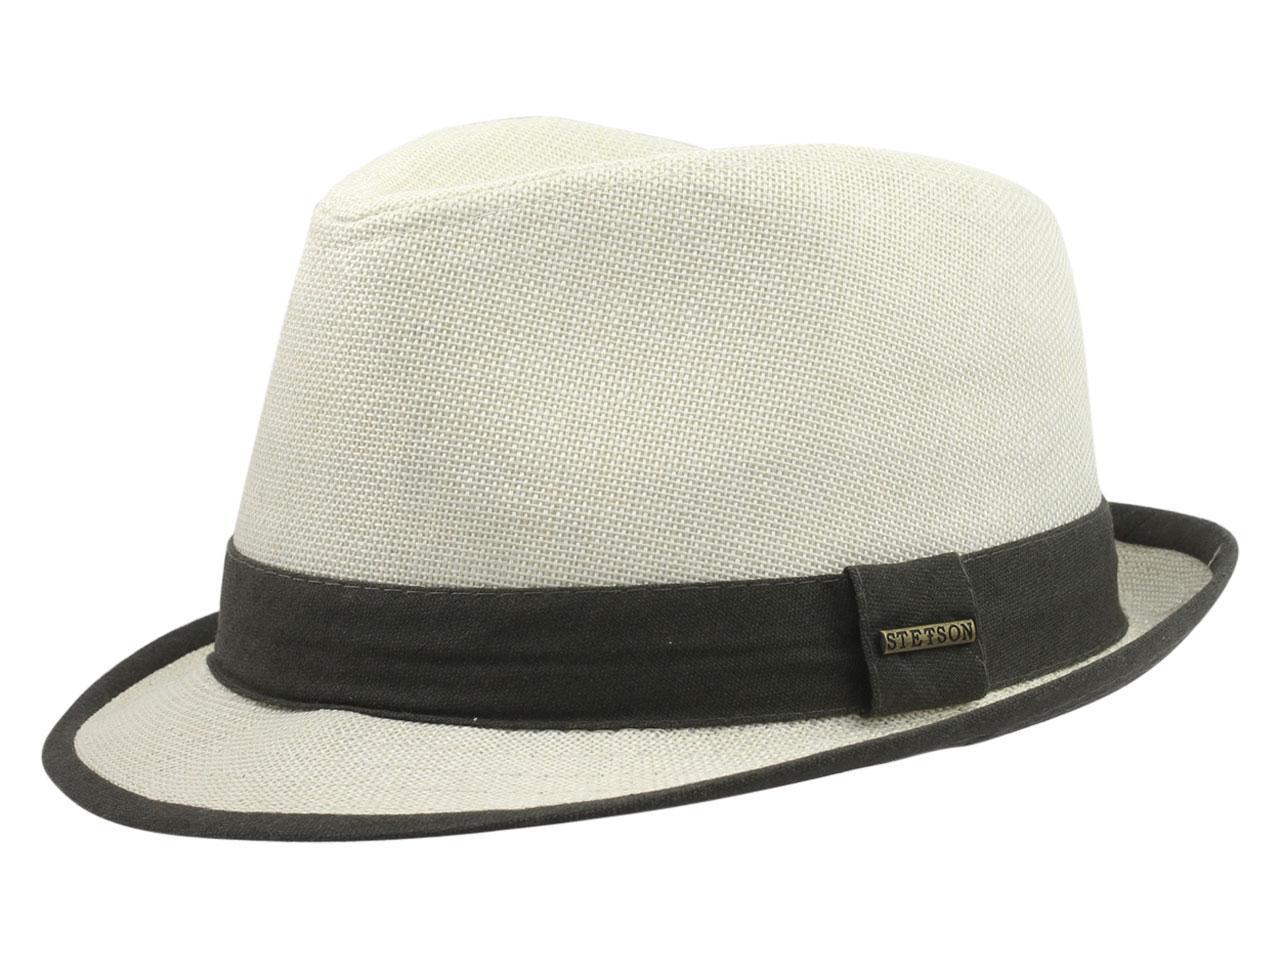 Image of Stetson Men's Contrast Trim Fedora Hat - Ivory - Large